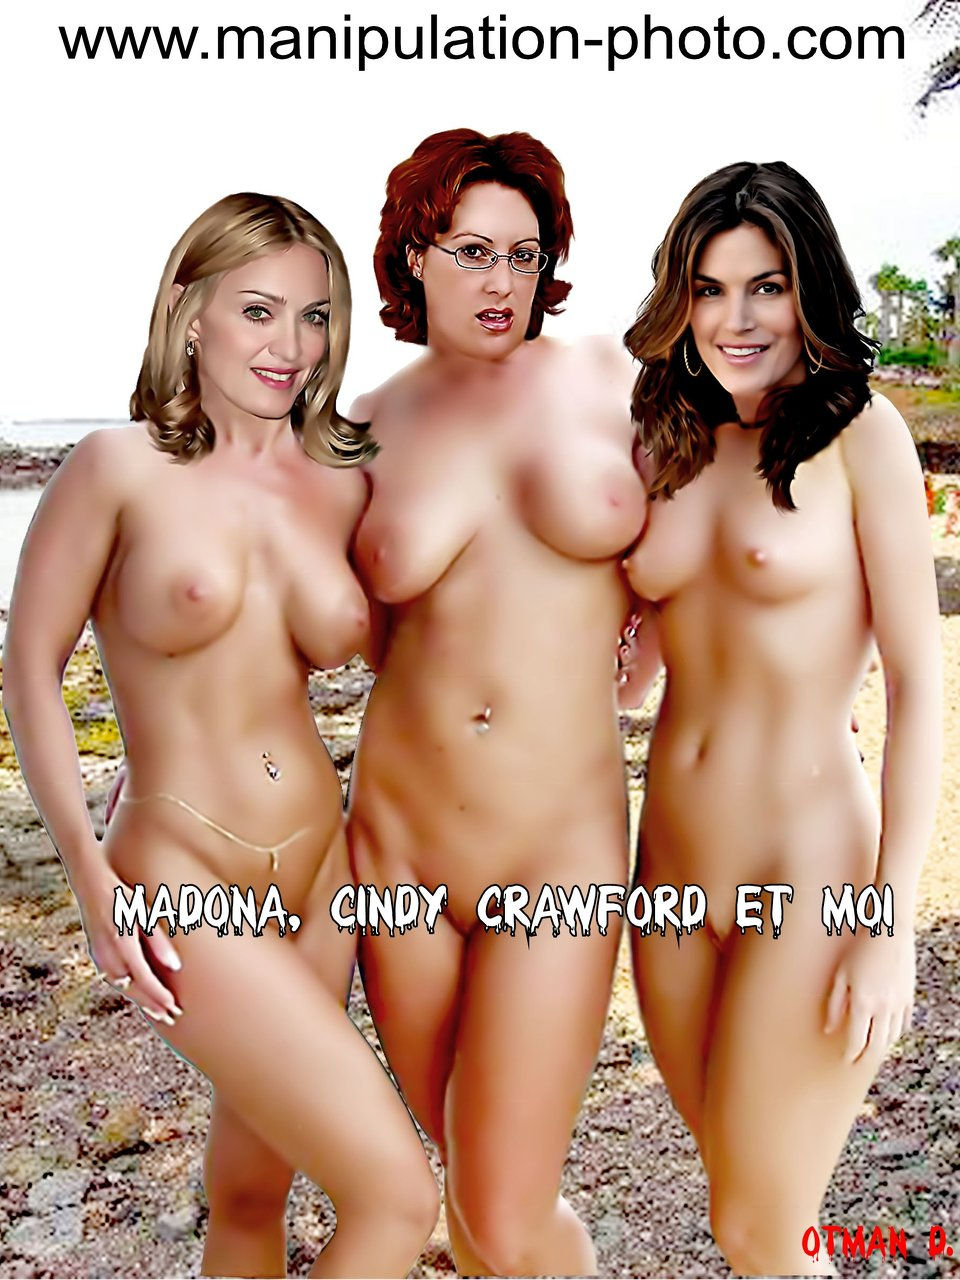 Madona Cindy Crawford et moi 33.jpg